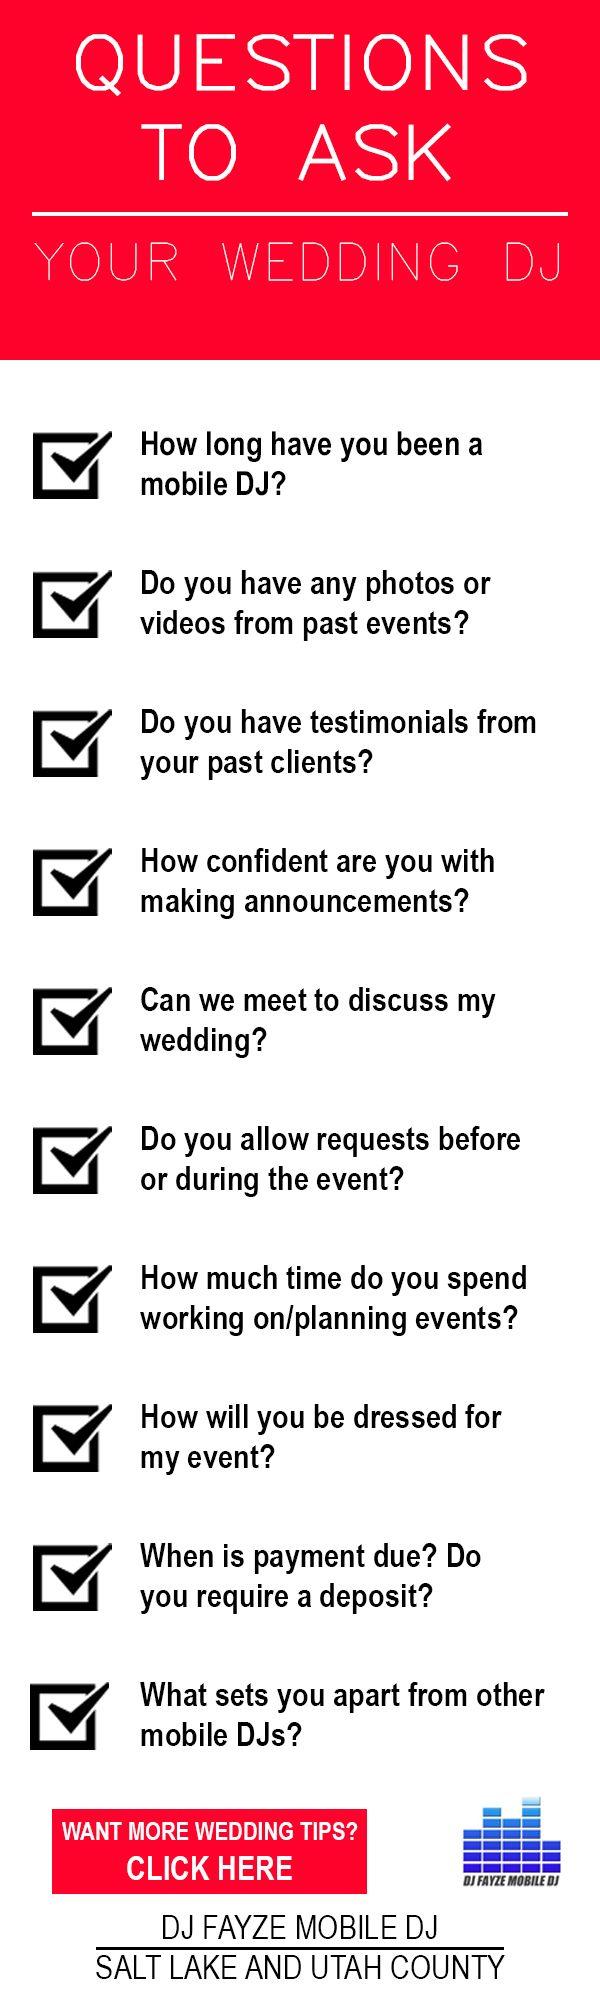 Utah Wedding - 10 questions you NEED to ask your wedding DJ! http://www.djfayze.com/the-dj-fayze-difference.html